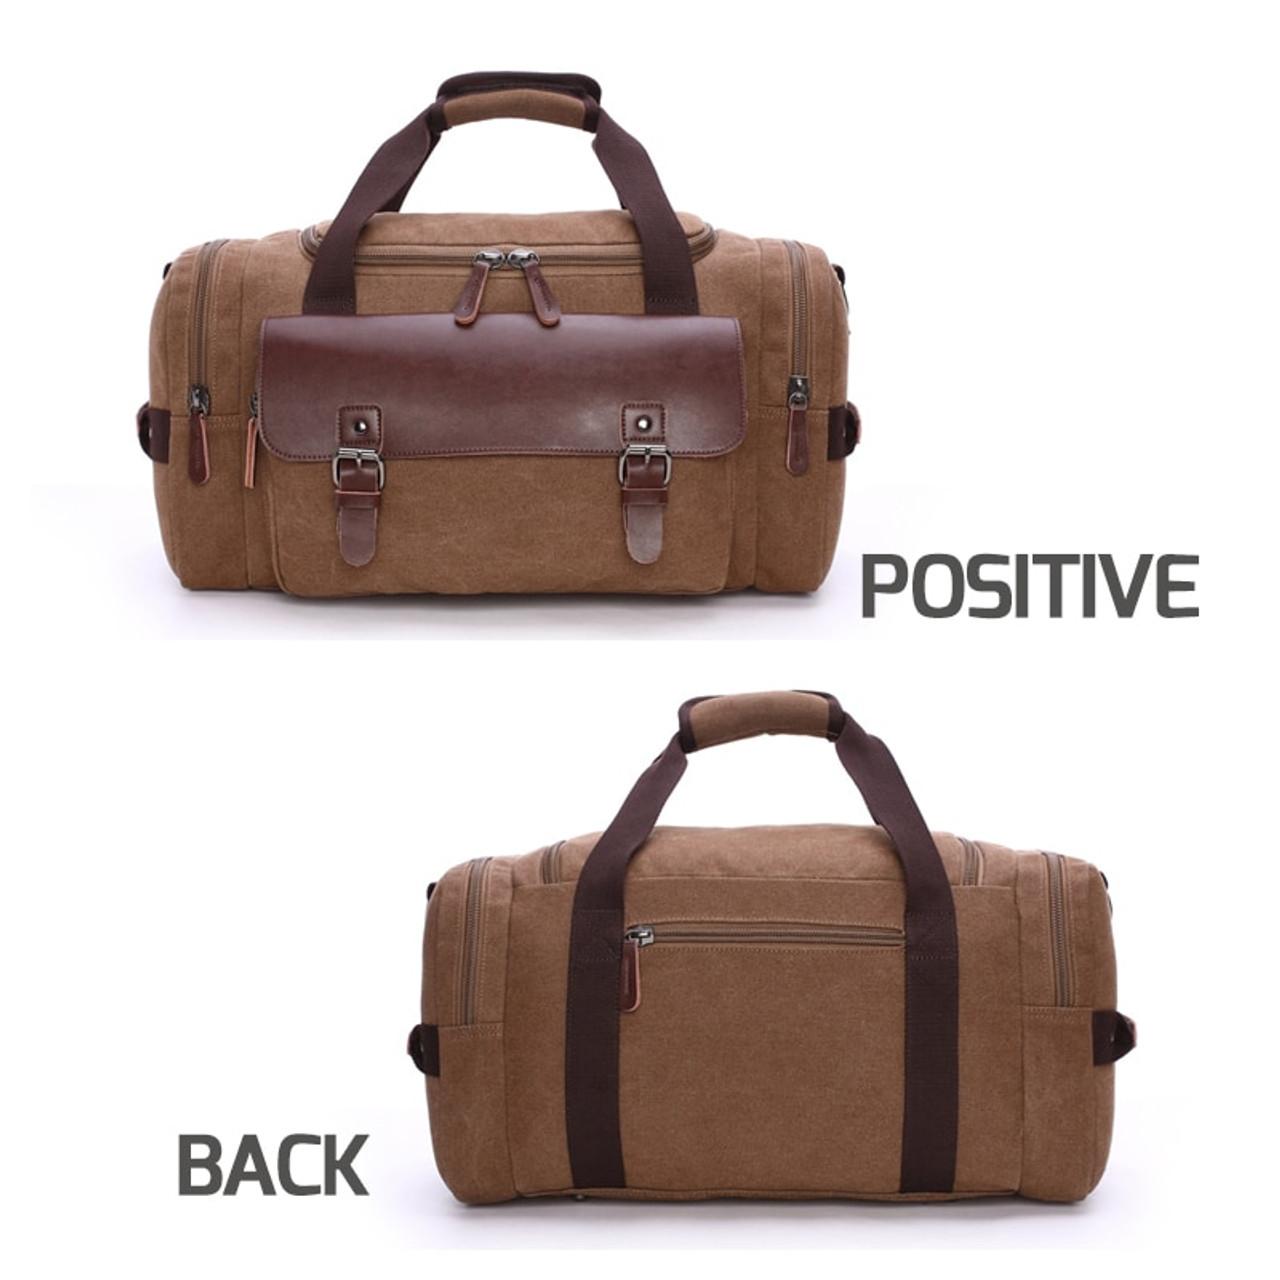 6e11ea460526 Scione Men Large Capacity Canvas Crossbody Travel Bags Practical Weekend  Luggage Duffel Bag Women High Quality Shoulder Handbag